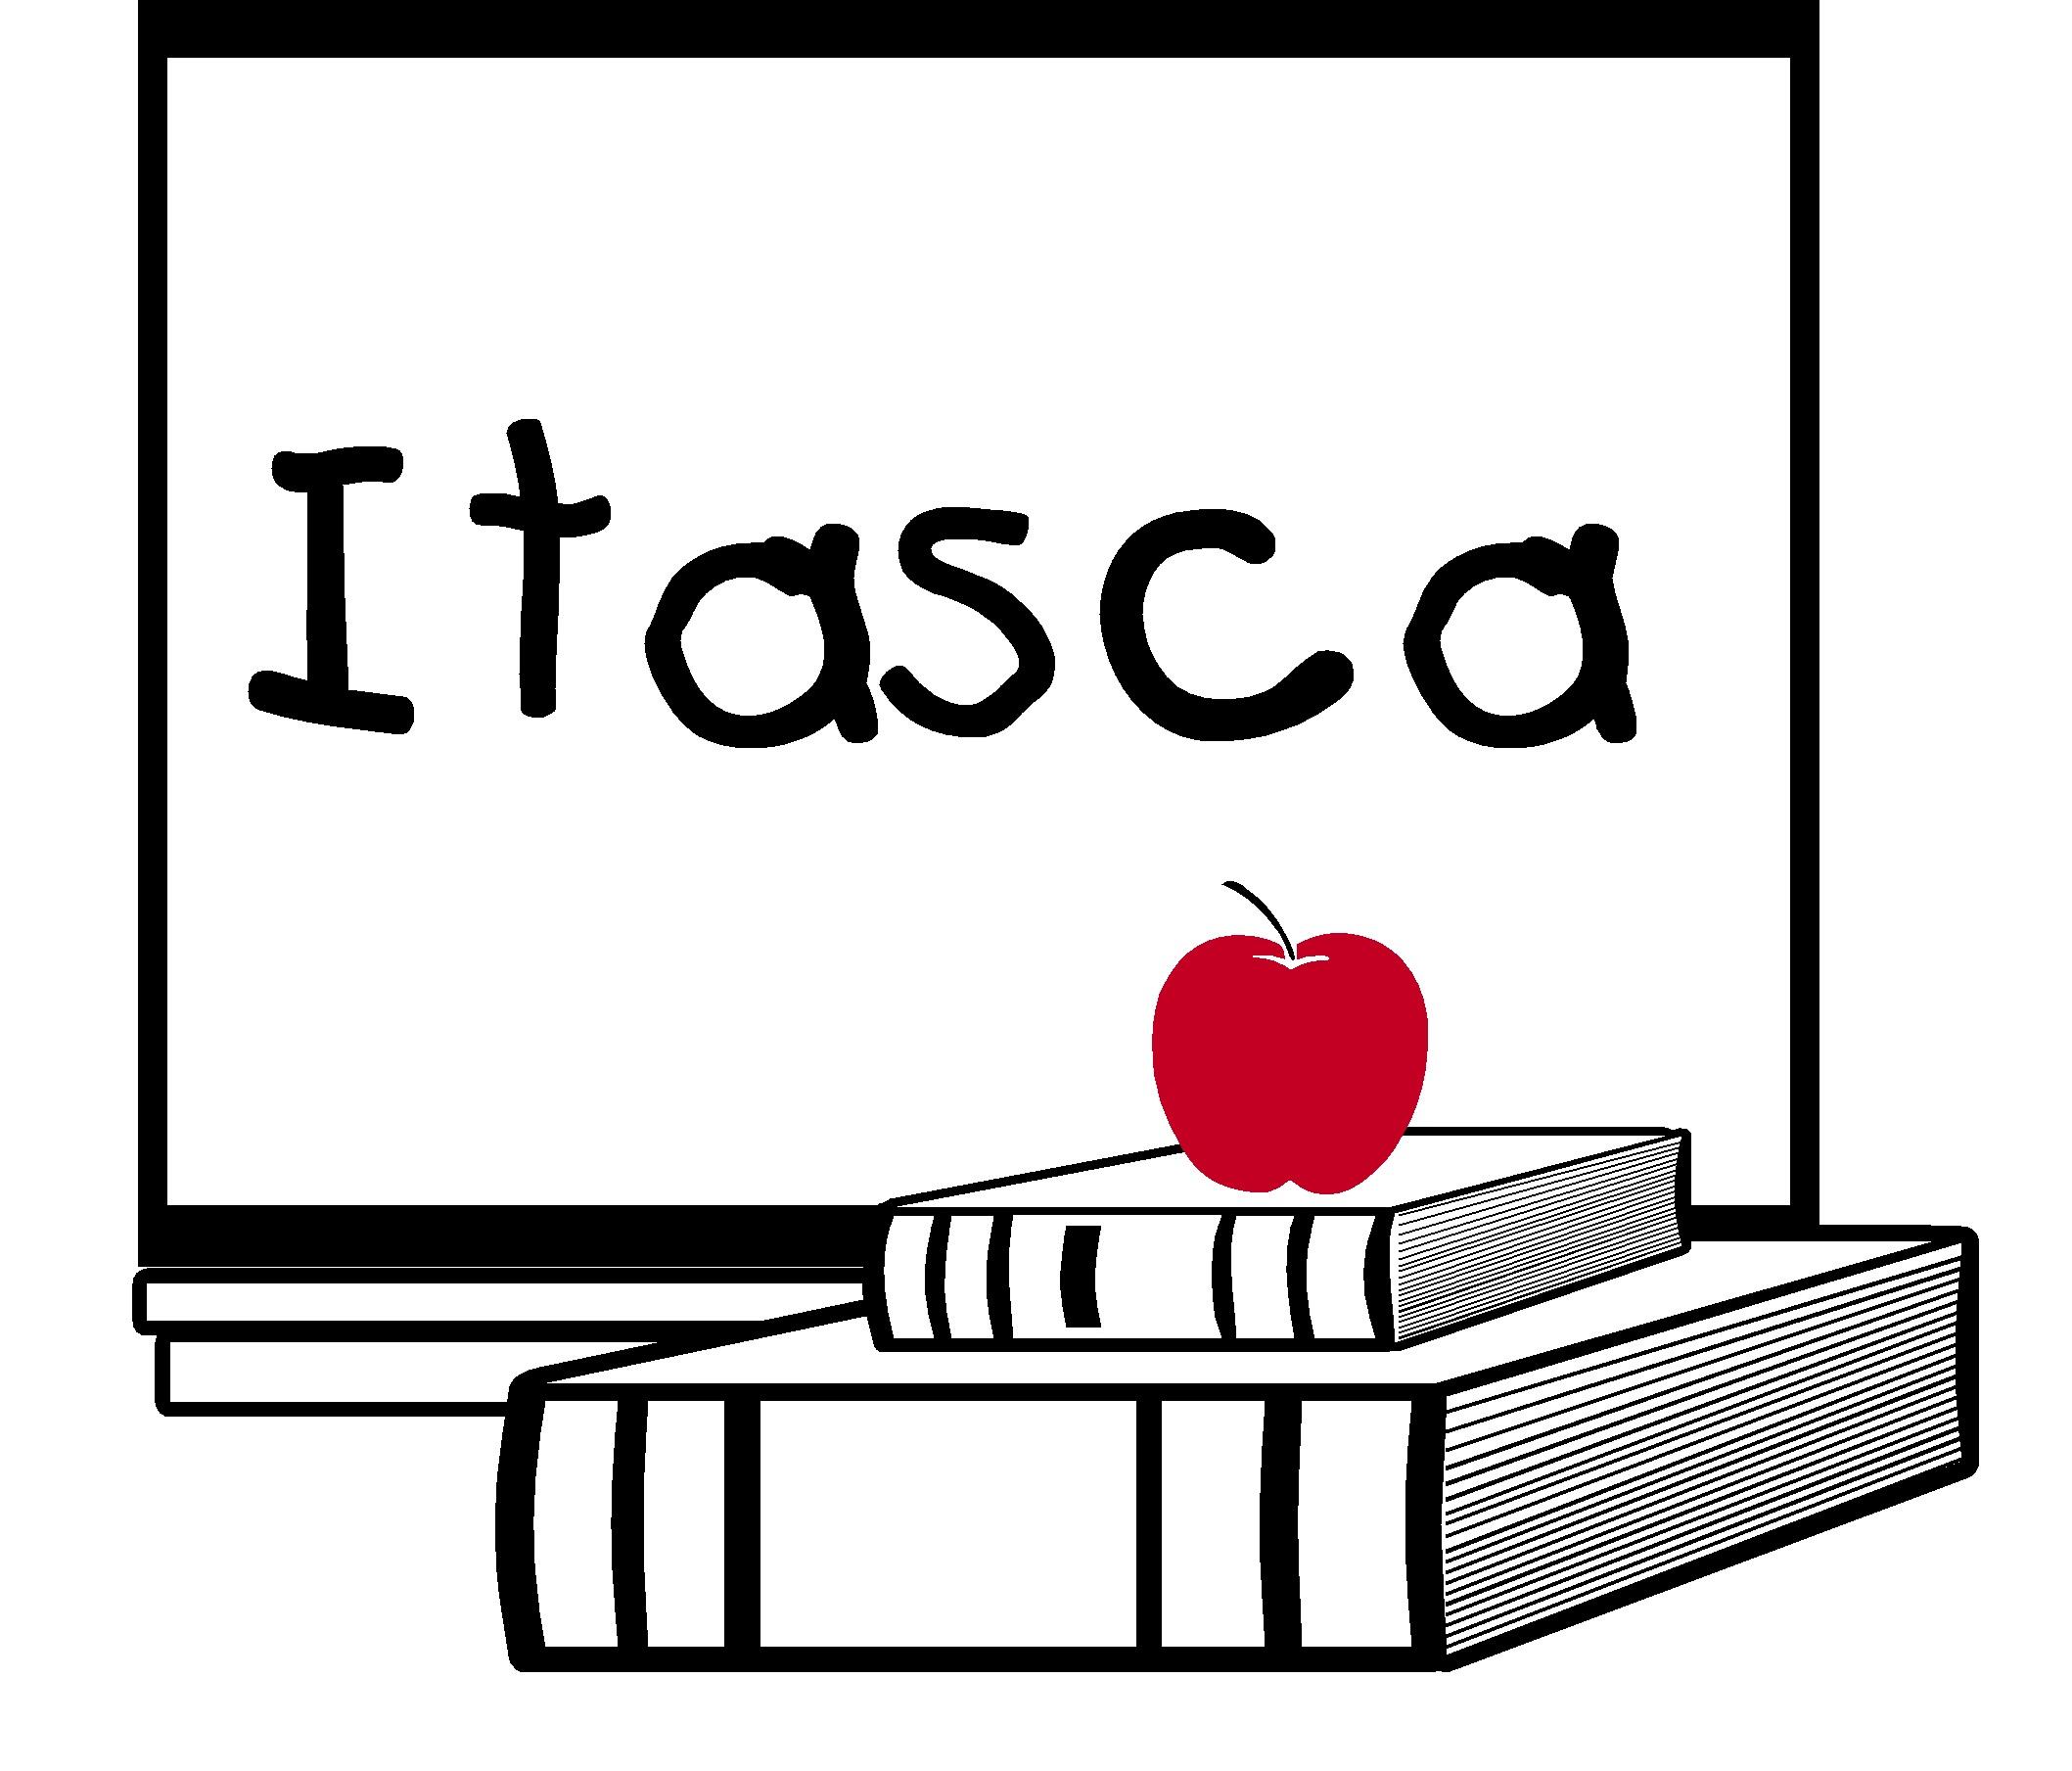 School board meeting clipart svg download Notice of School Board Vacancy - Itasca School District 10 svg download